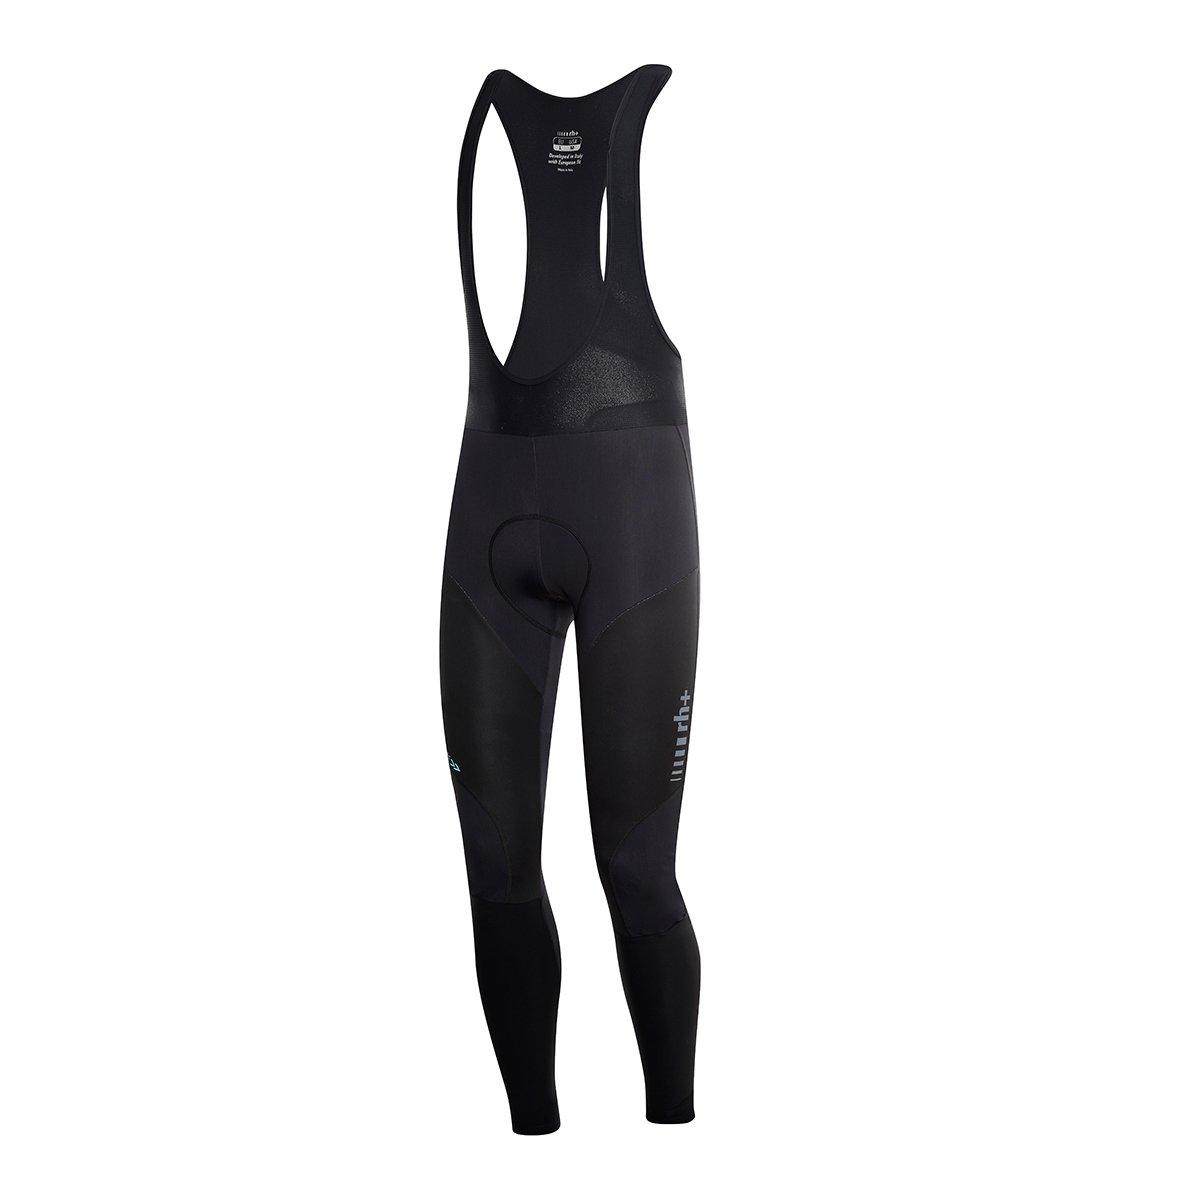 RH + Shark Bibtights, Pantalones (Ciclismo) Hombre, Black, XL rh+ ICU0425 900XL